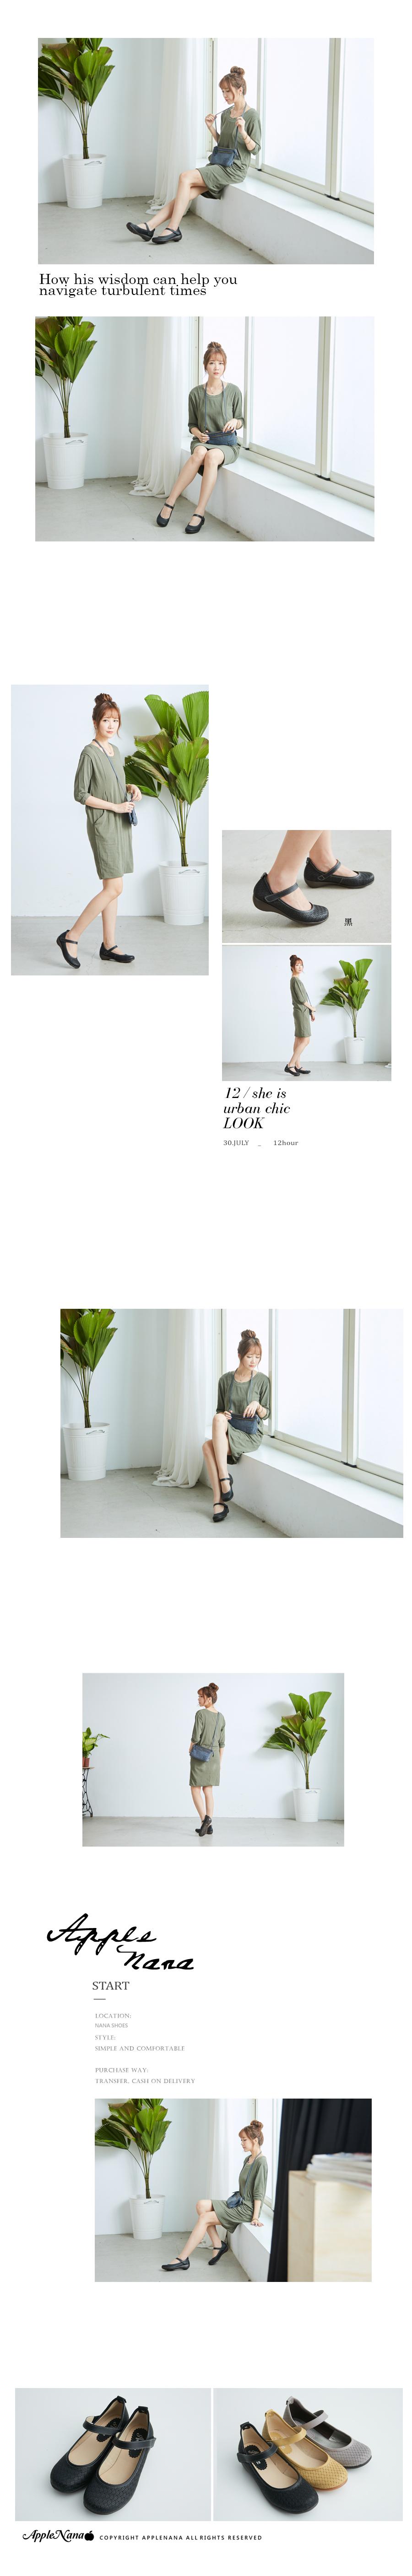 http://shop.r10s.com/5e7ca0c0-ec8c-11e4-ac44-005056b756e3/2016-04/10128-1.jpg